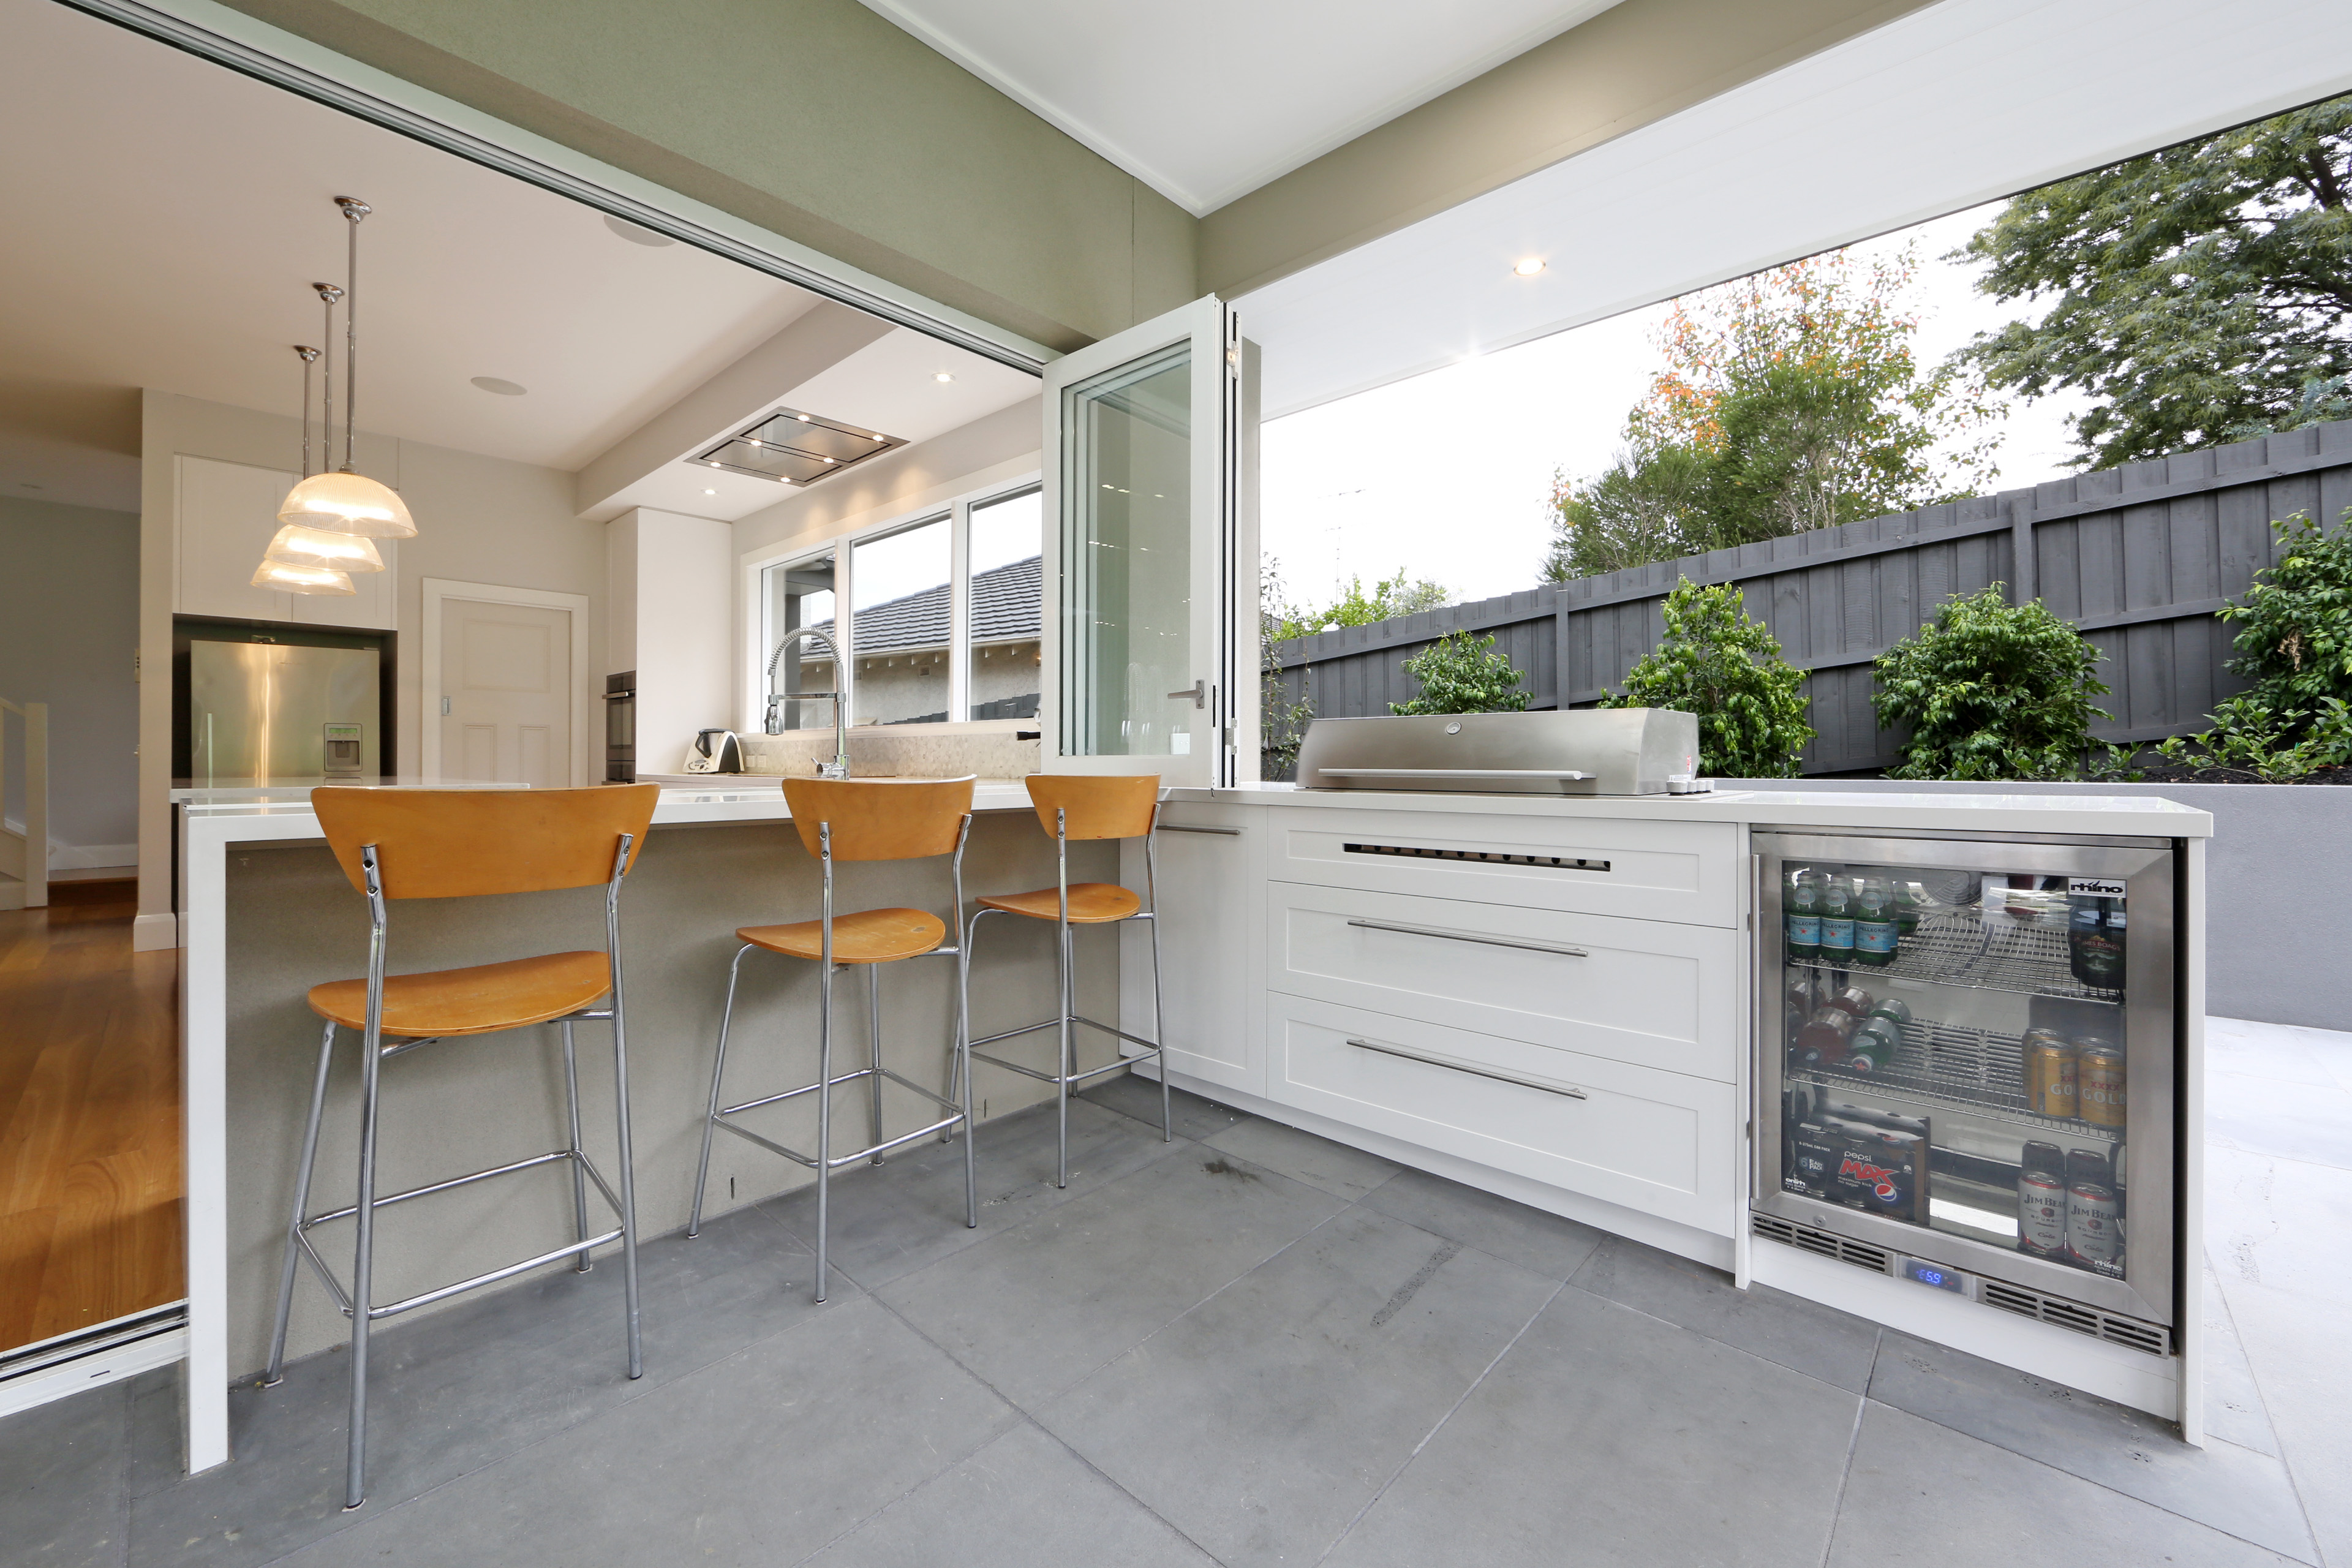 Image Result For Outdoor Kitchen Modern